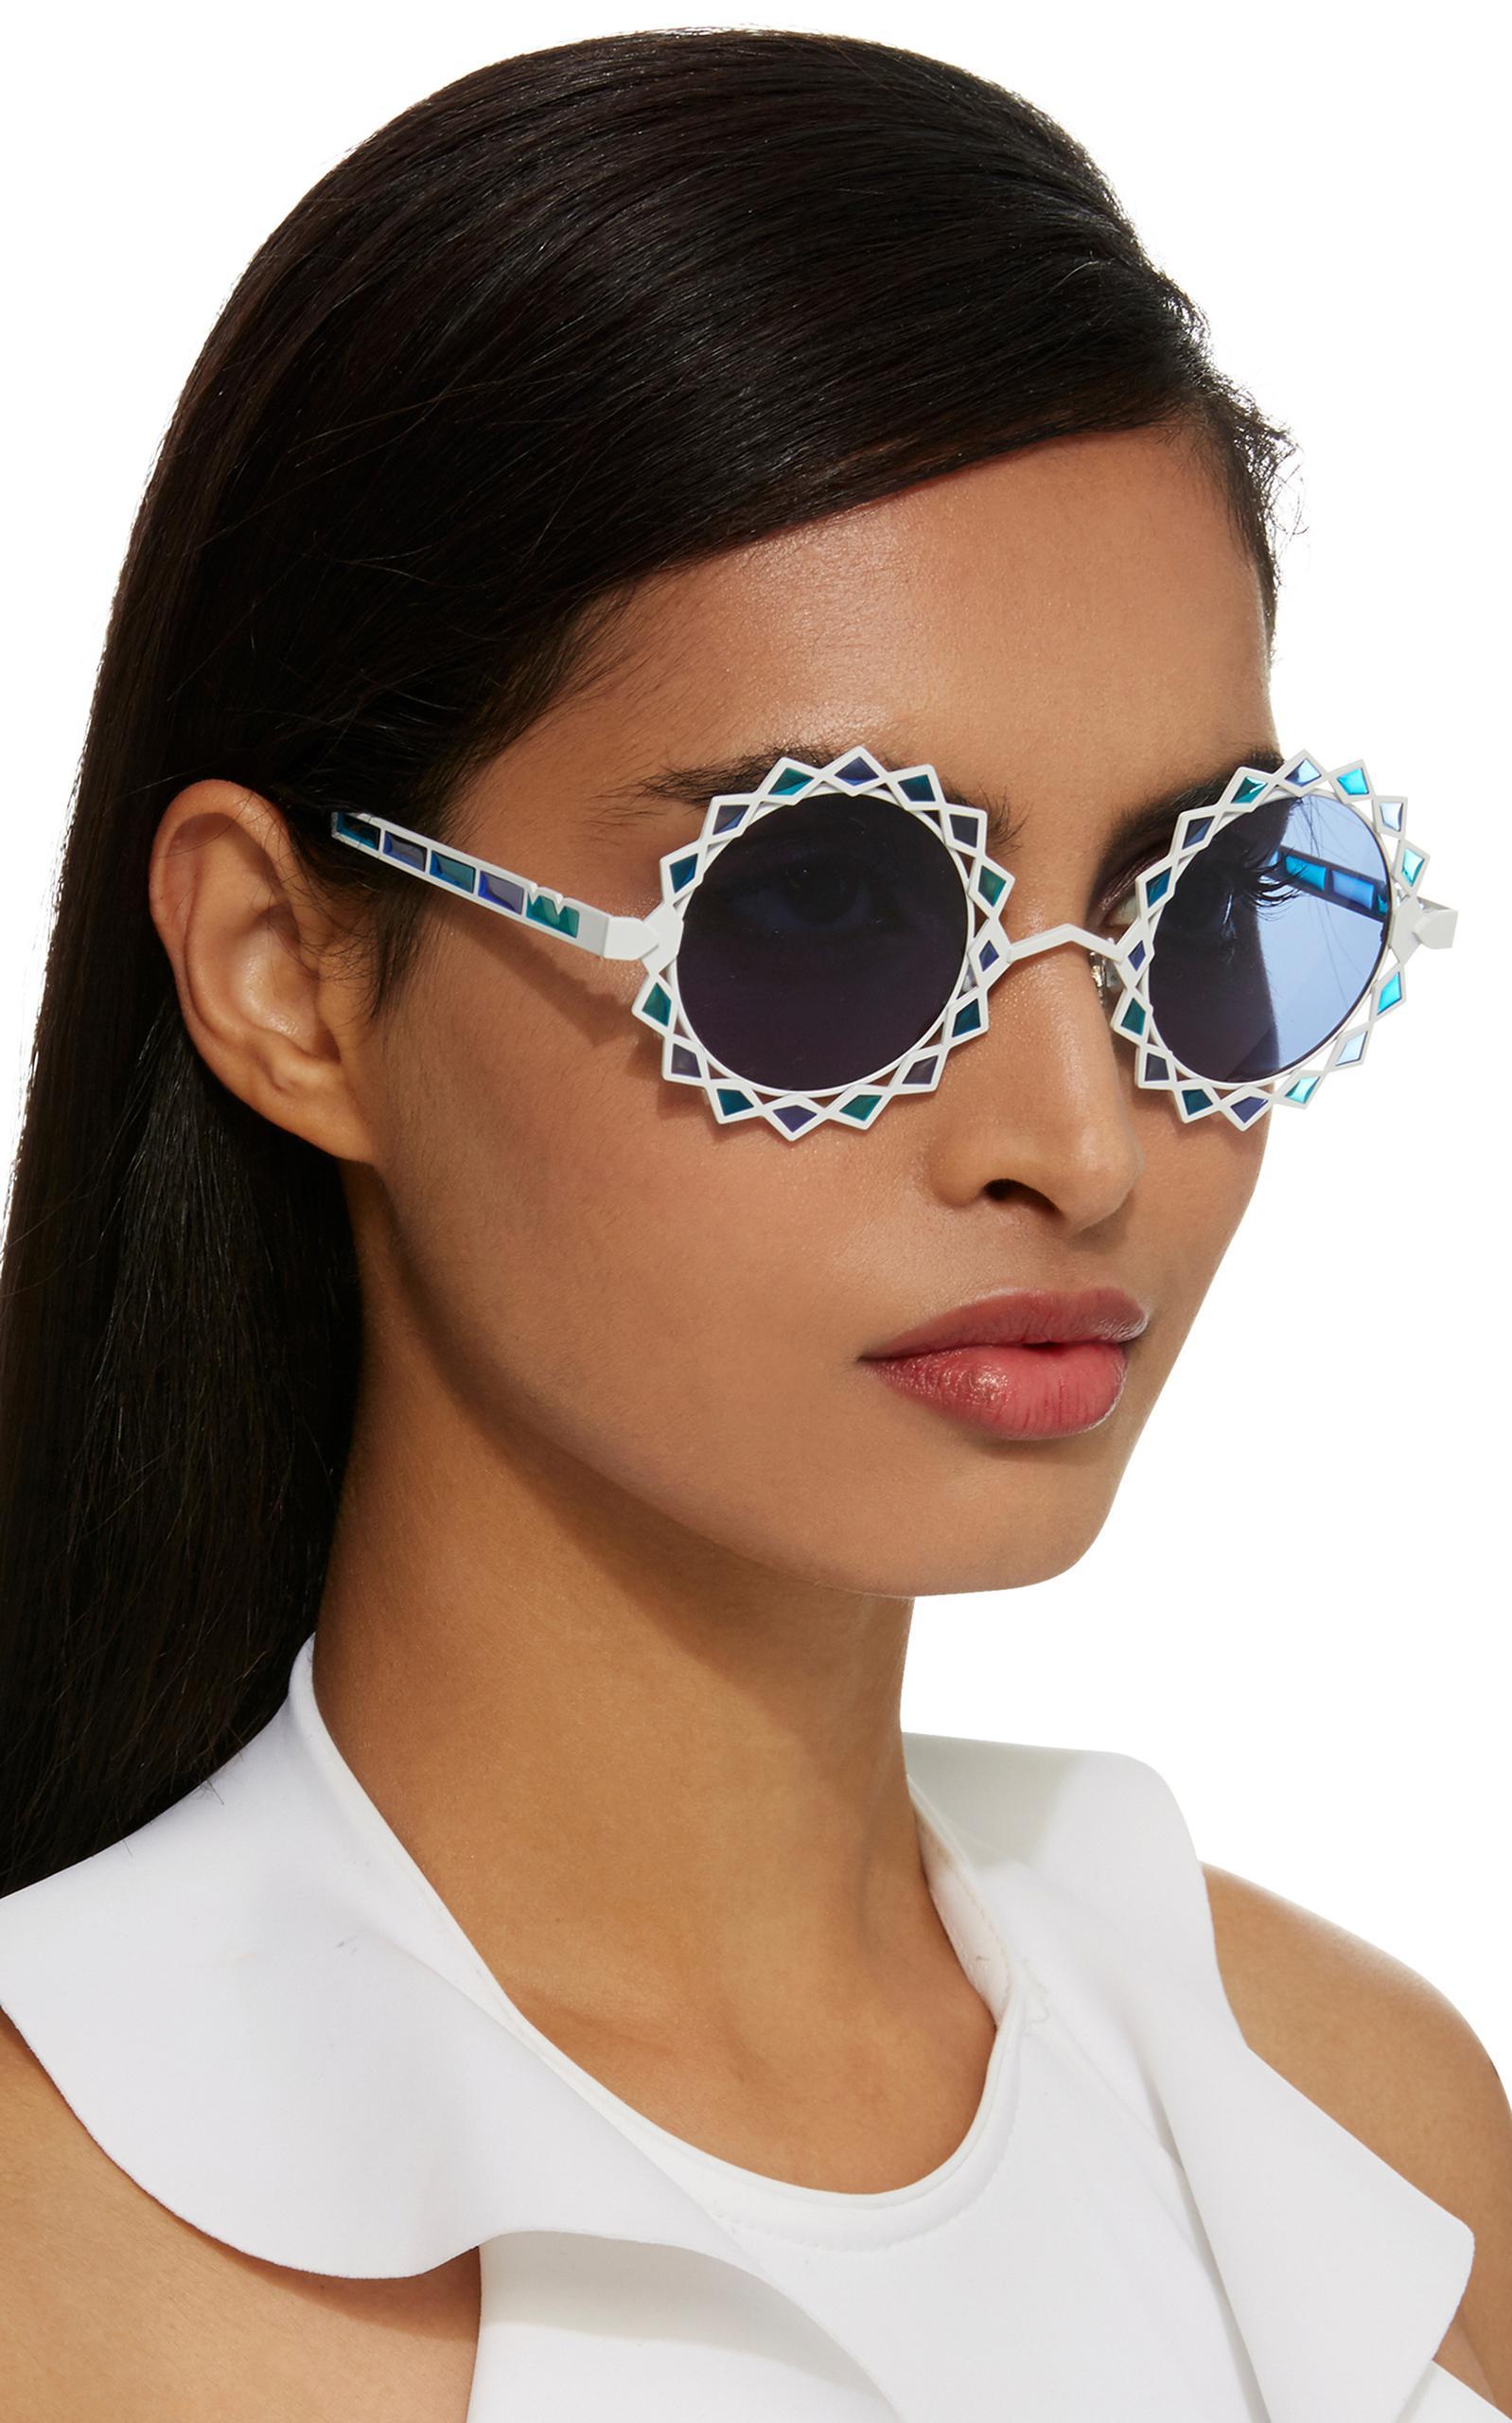 Lyst - Pared Eyewear Moon & Stars Acetate Round-frame Sunglasses in Blue